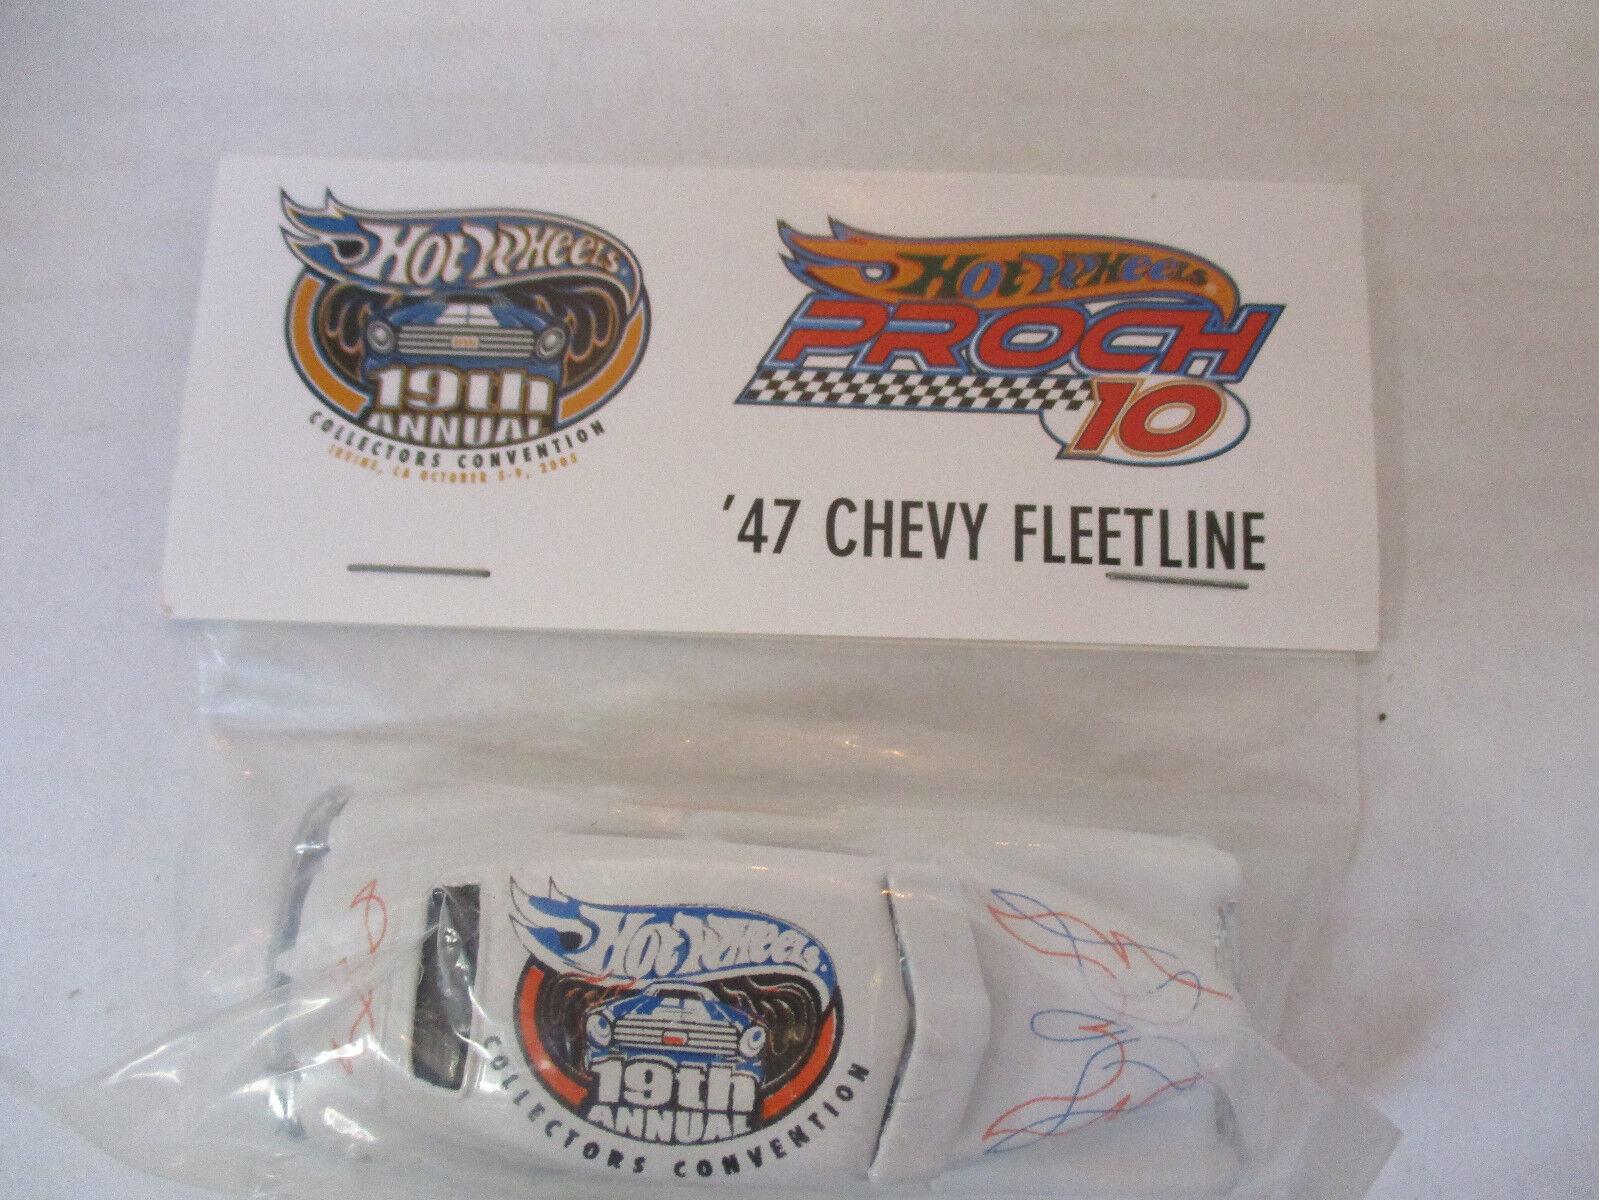 Hot Wheels 19th Annual Collectors Convention Proch 10 '47 Chevy Fleetline NIP